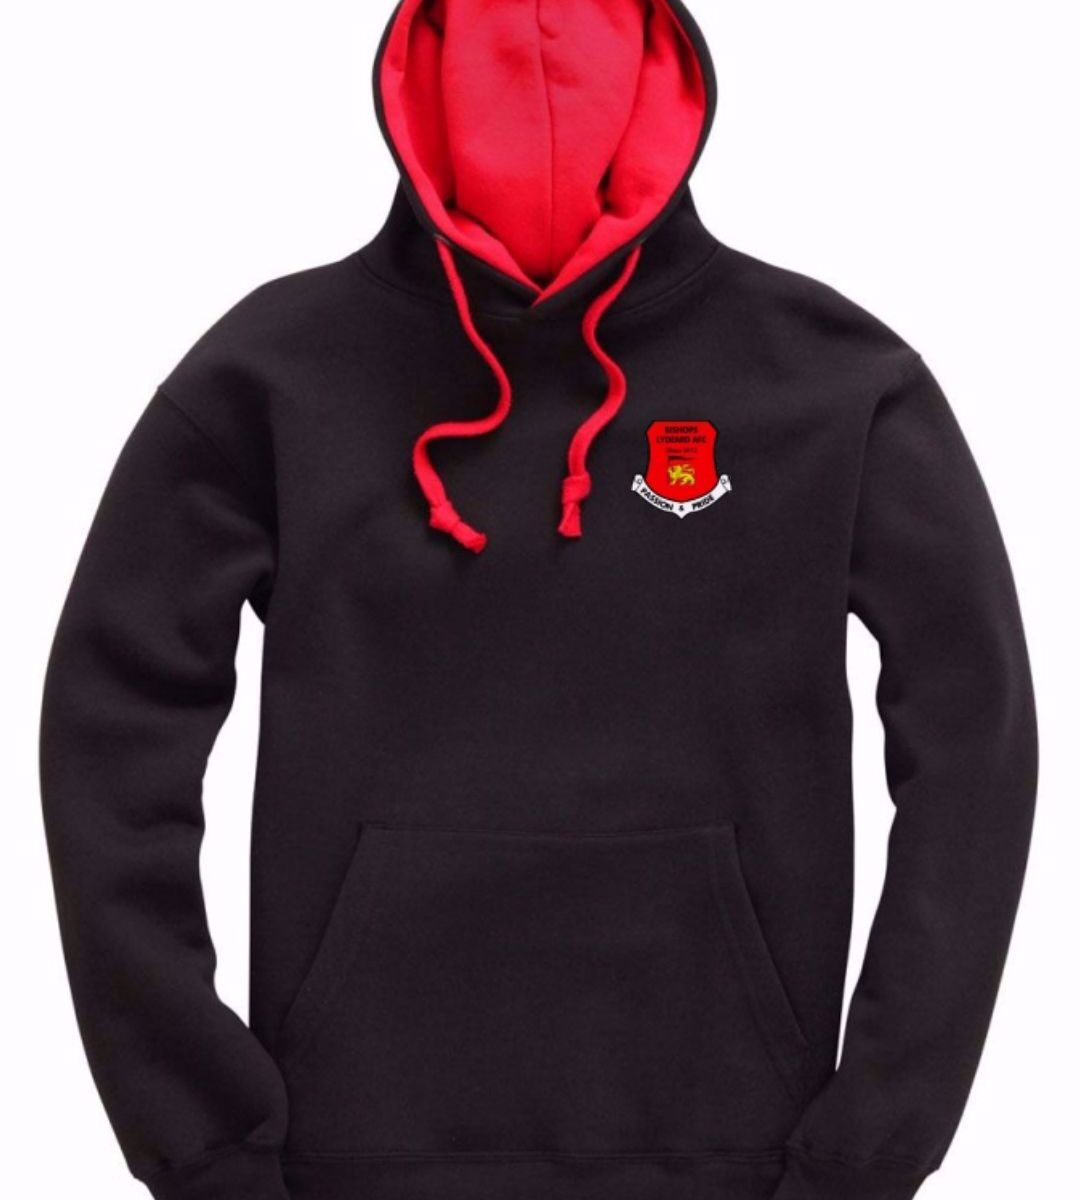 Bishops Lydeard FC Hoody - JUNIOR SIZES